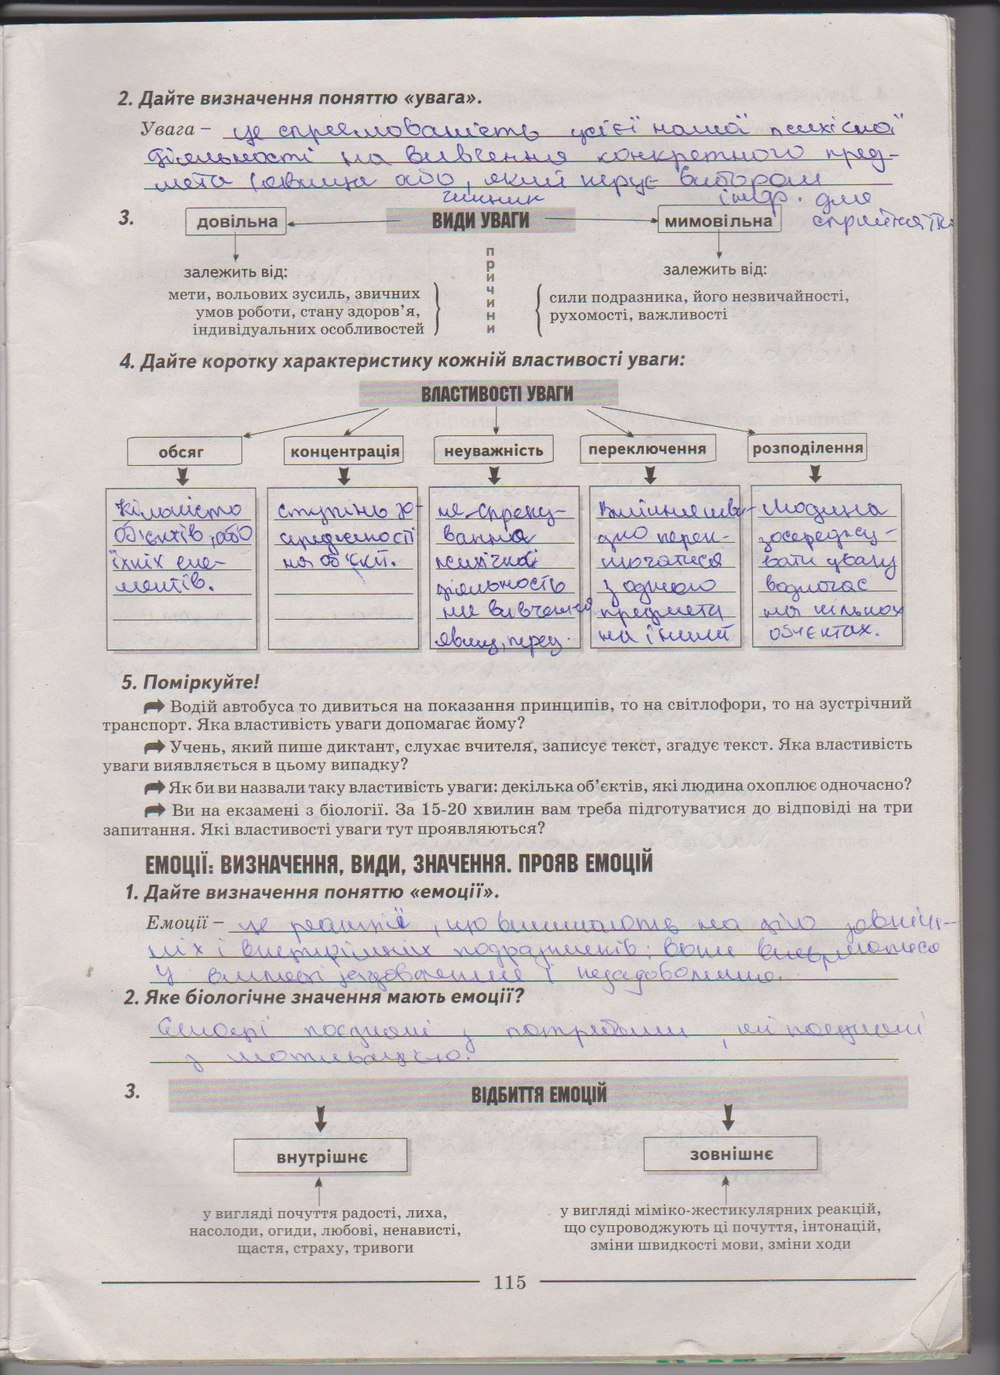 а.калинчук з 7 для класса зошите гдз по биологии